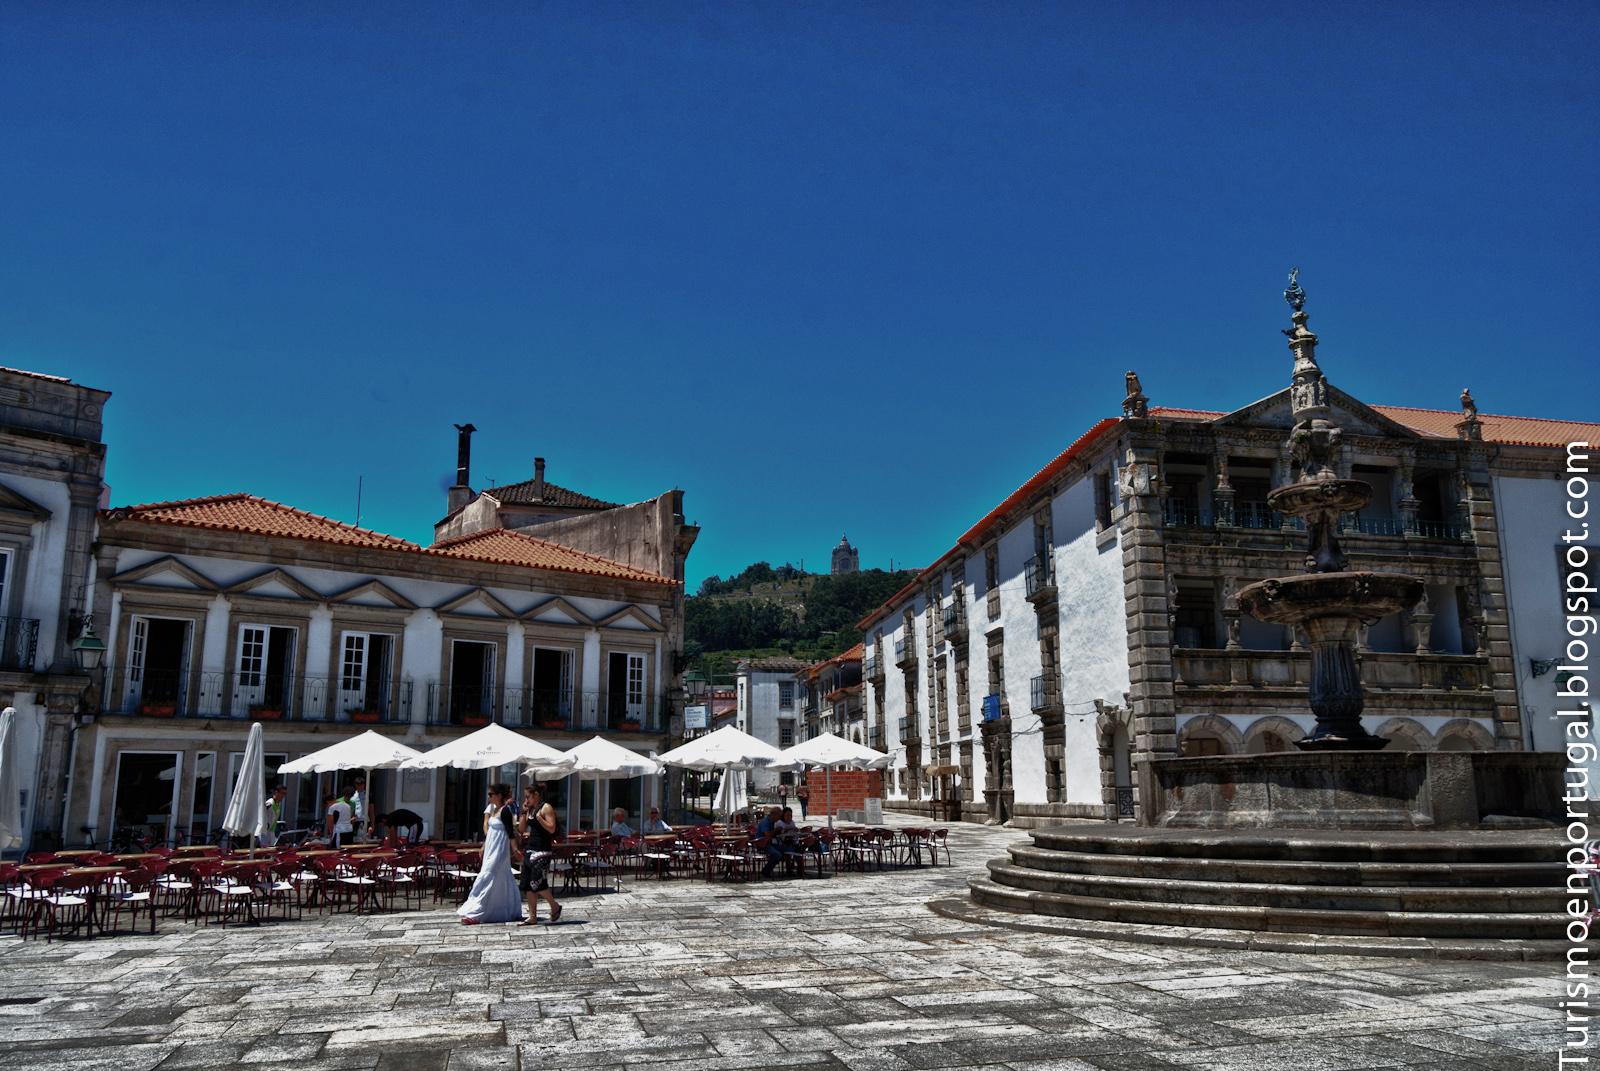 Redelivered Do Castelo Viana